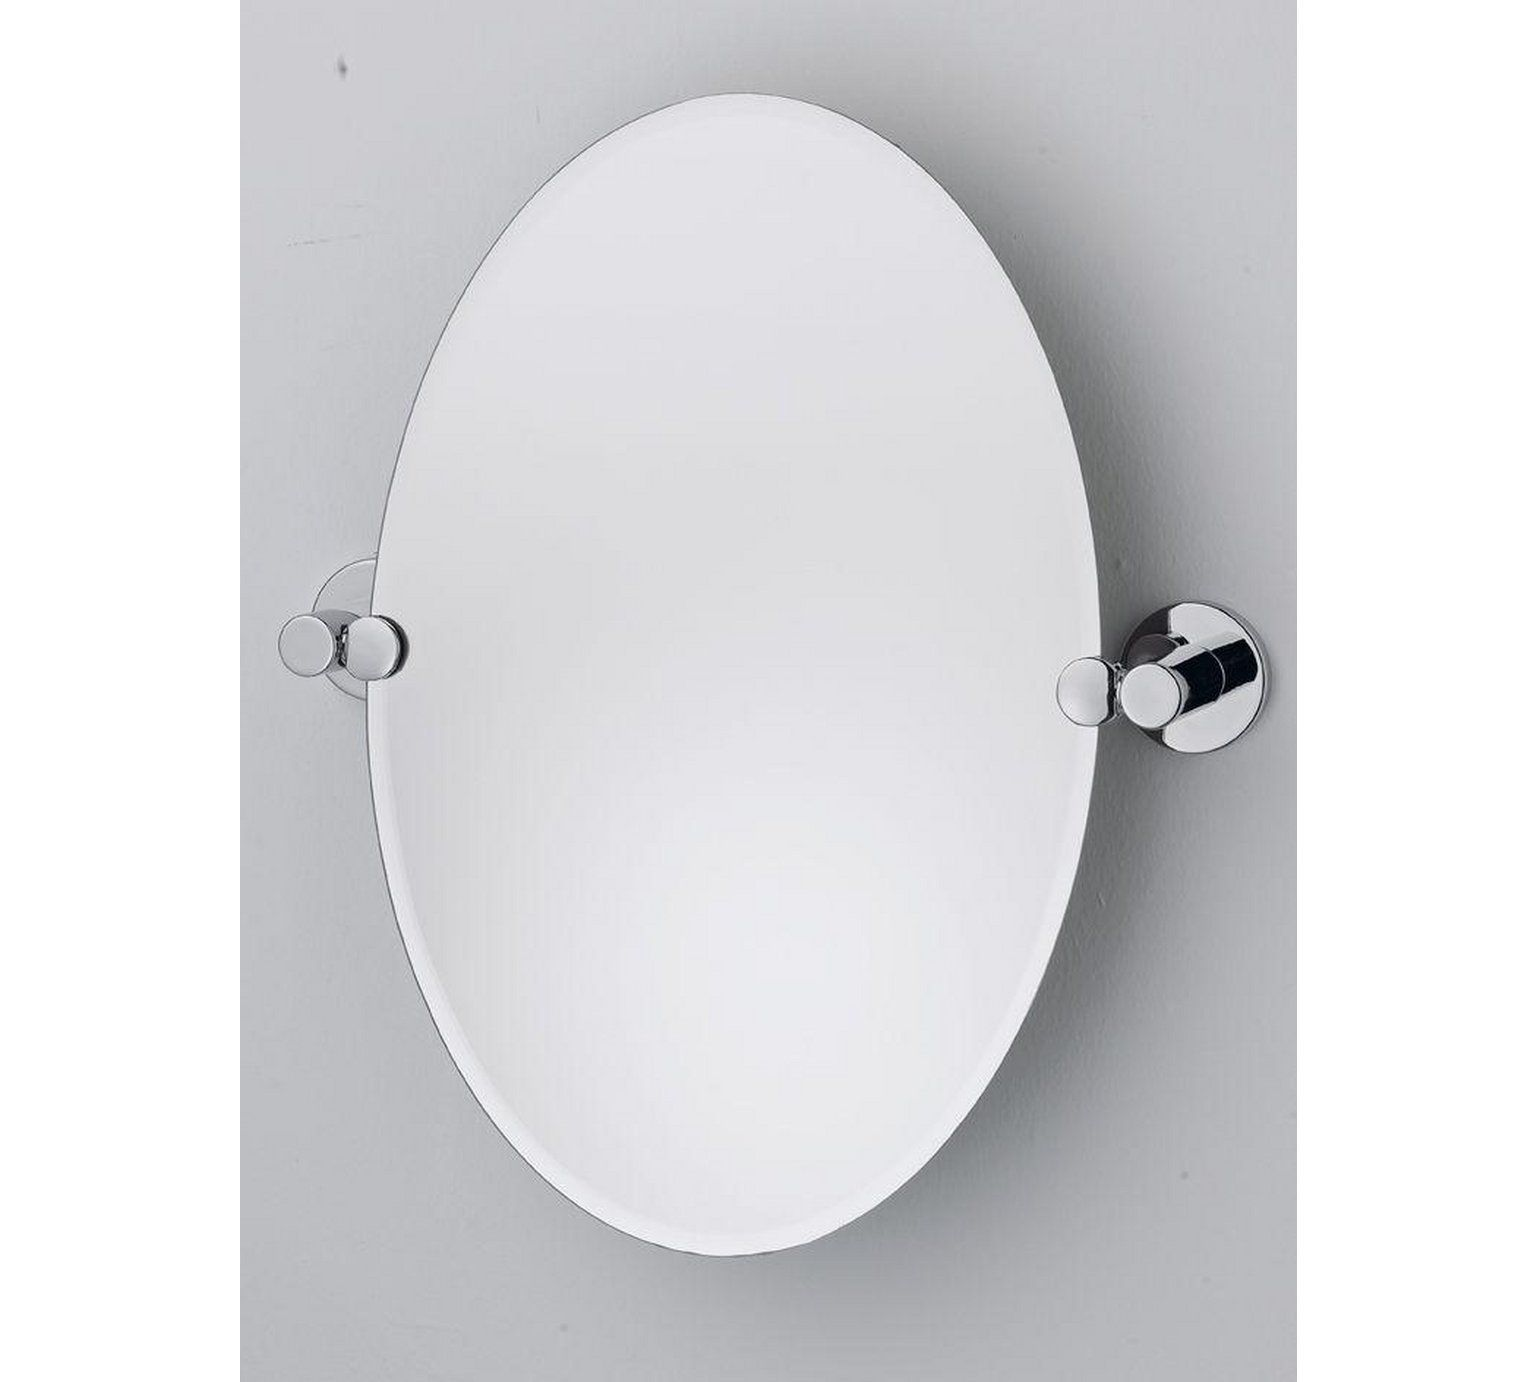 Buy Collection Oval Tilting Bevelled Bathroom Mirror At Argos Co Uk Visit Argos Co Uk To Shop Online For Mirrors Home Furni Bathroom Mirror Mirror Argos Home